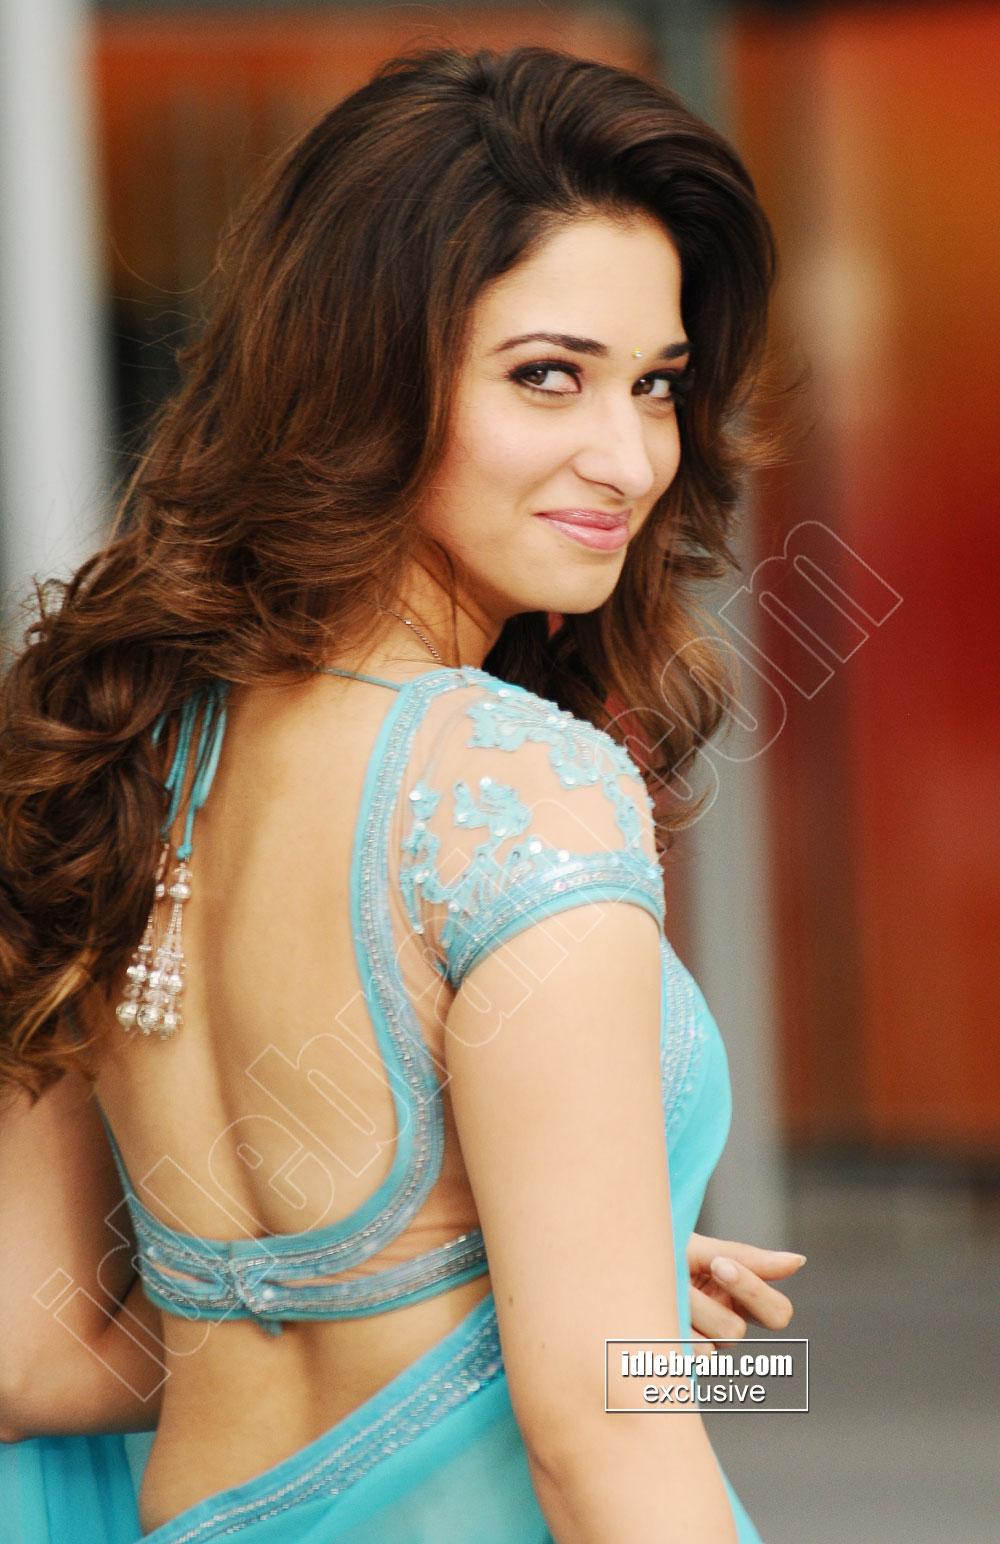 prabash hot tamanna blue saree remove navel kissing from rebal movie